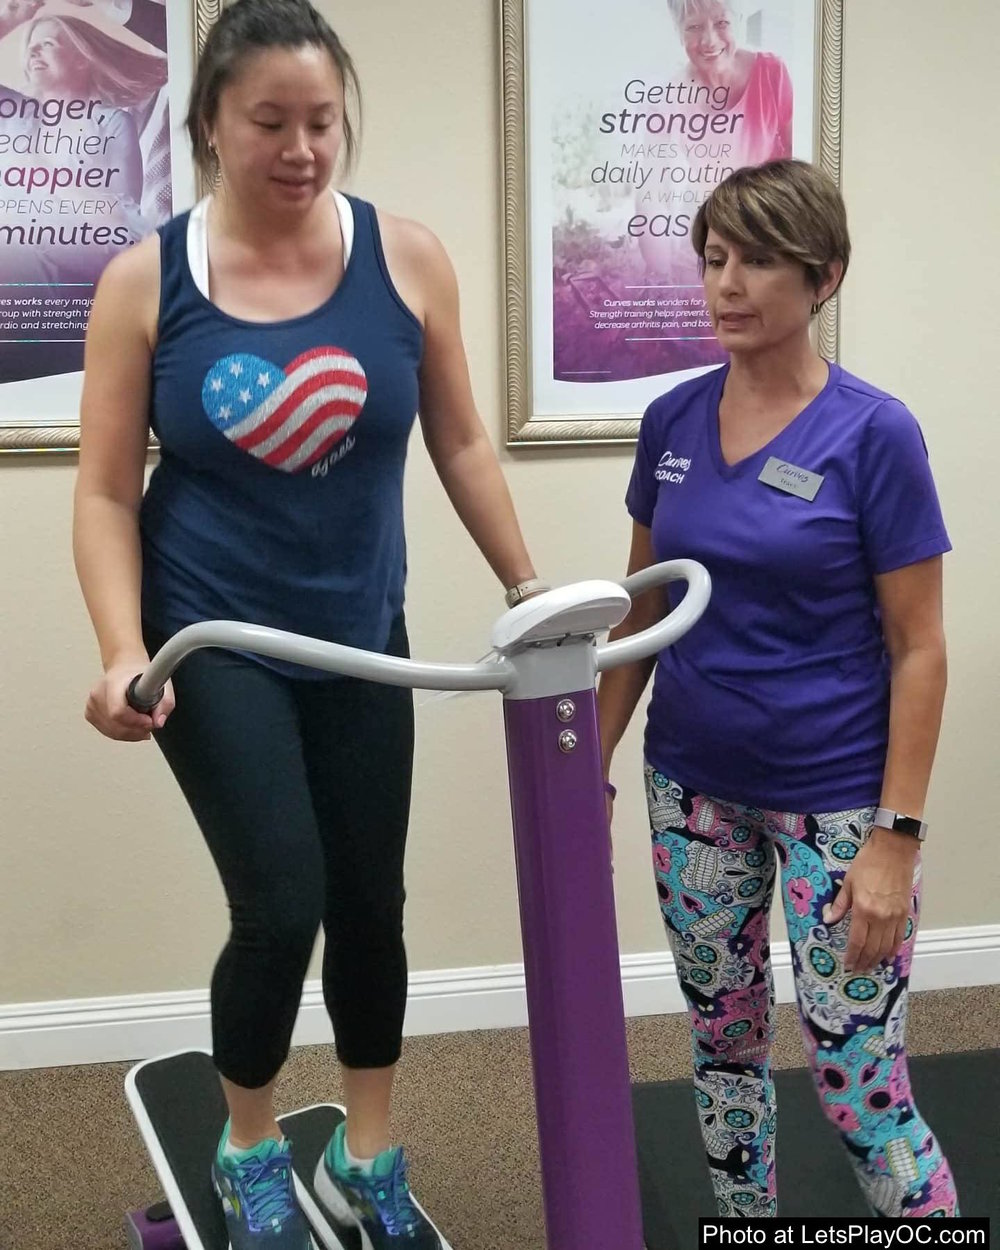 Curves Women Fitness Heartrate Machine Photo at LetsPlayOC.jpg